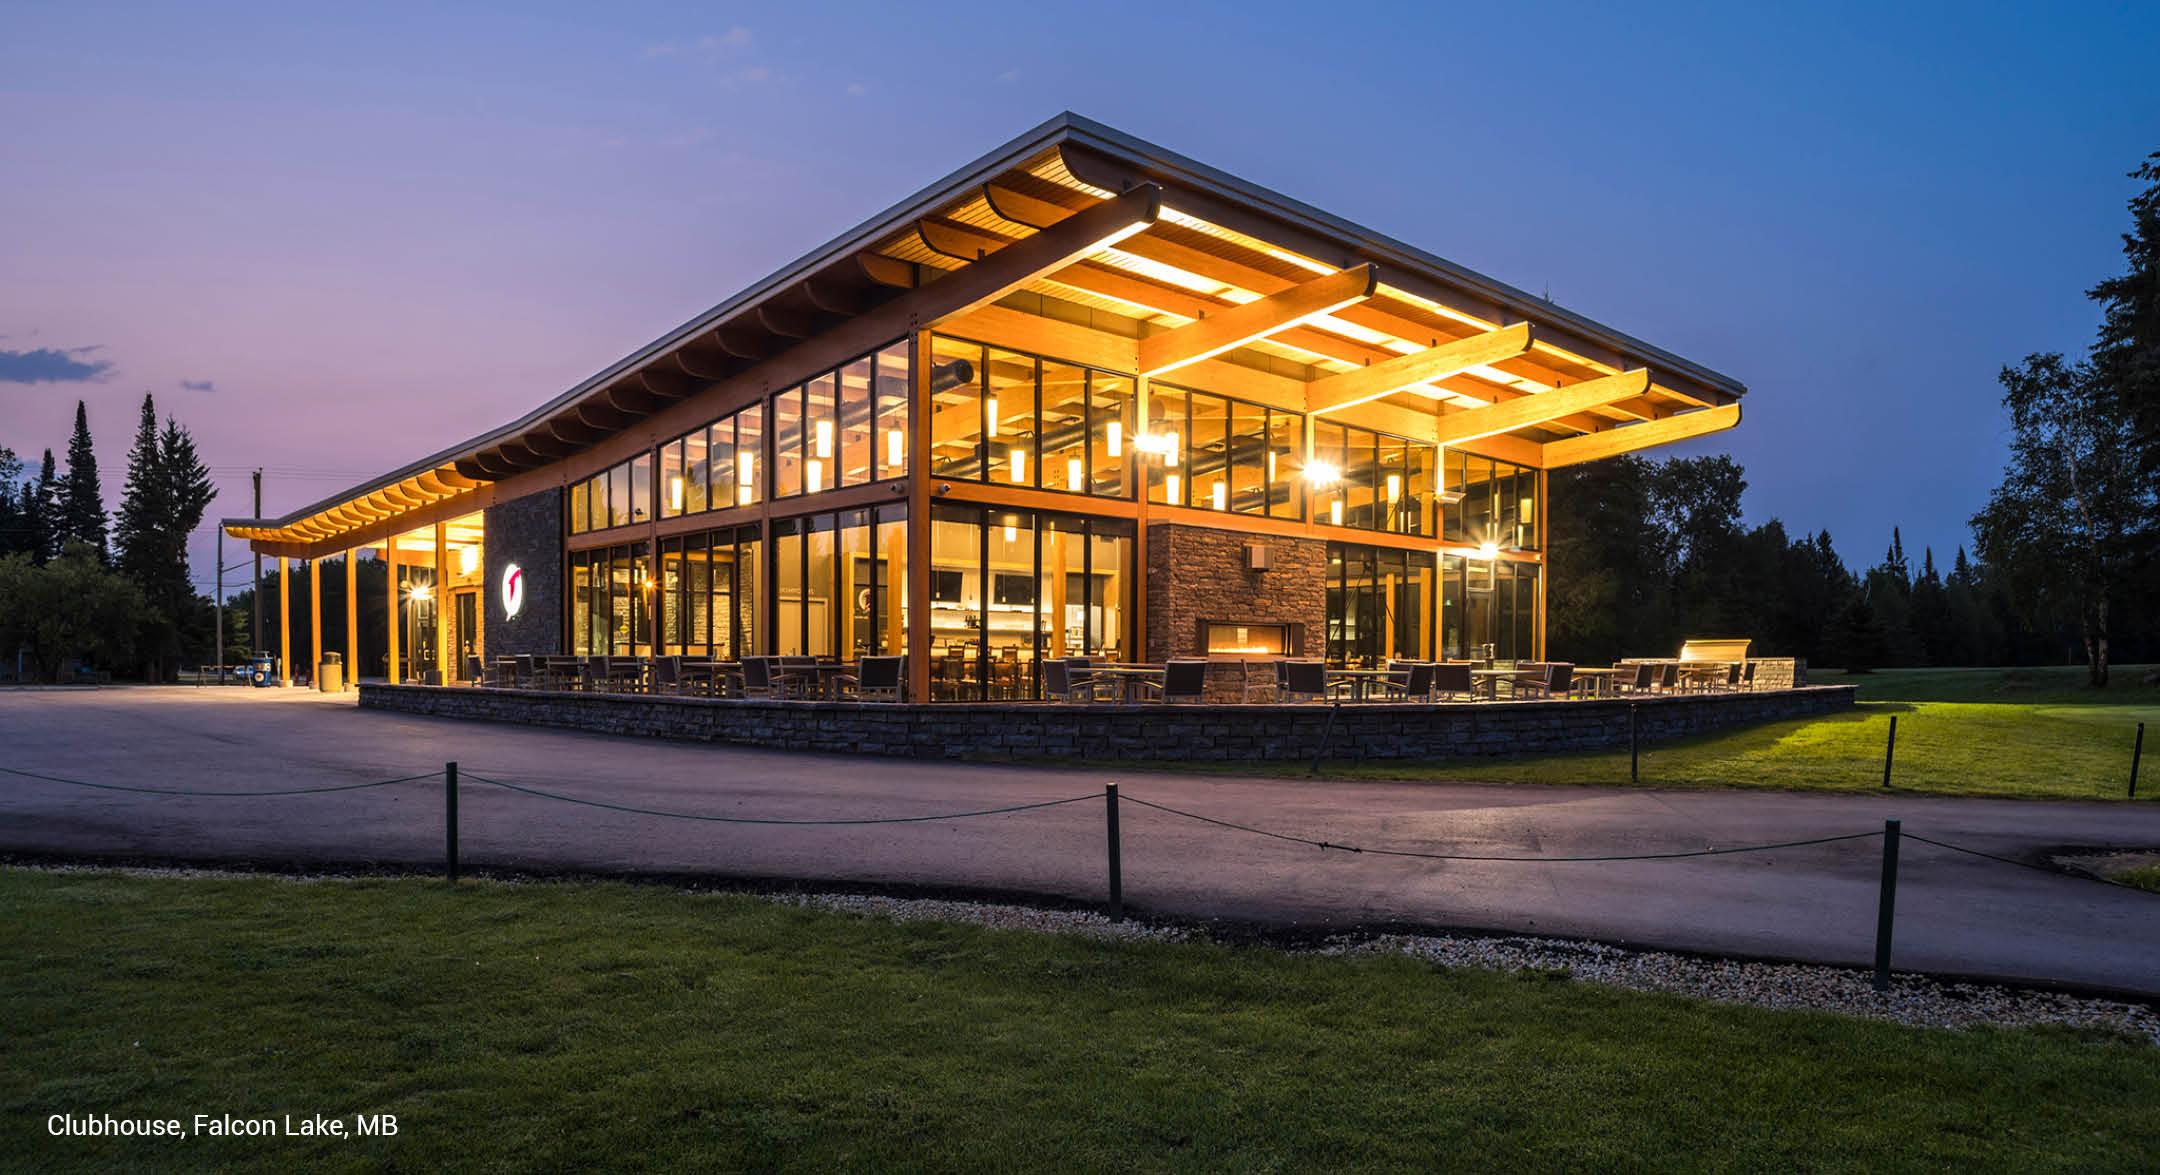 https://cornerstonemasstimber.com/wp-content/uploads/2020/09/cornerstone-mass-timber-Clubhouse-Falcon-Lake-MB-1.jpg